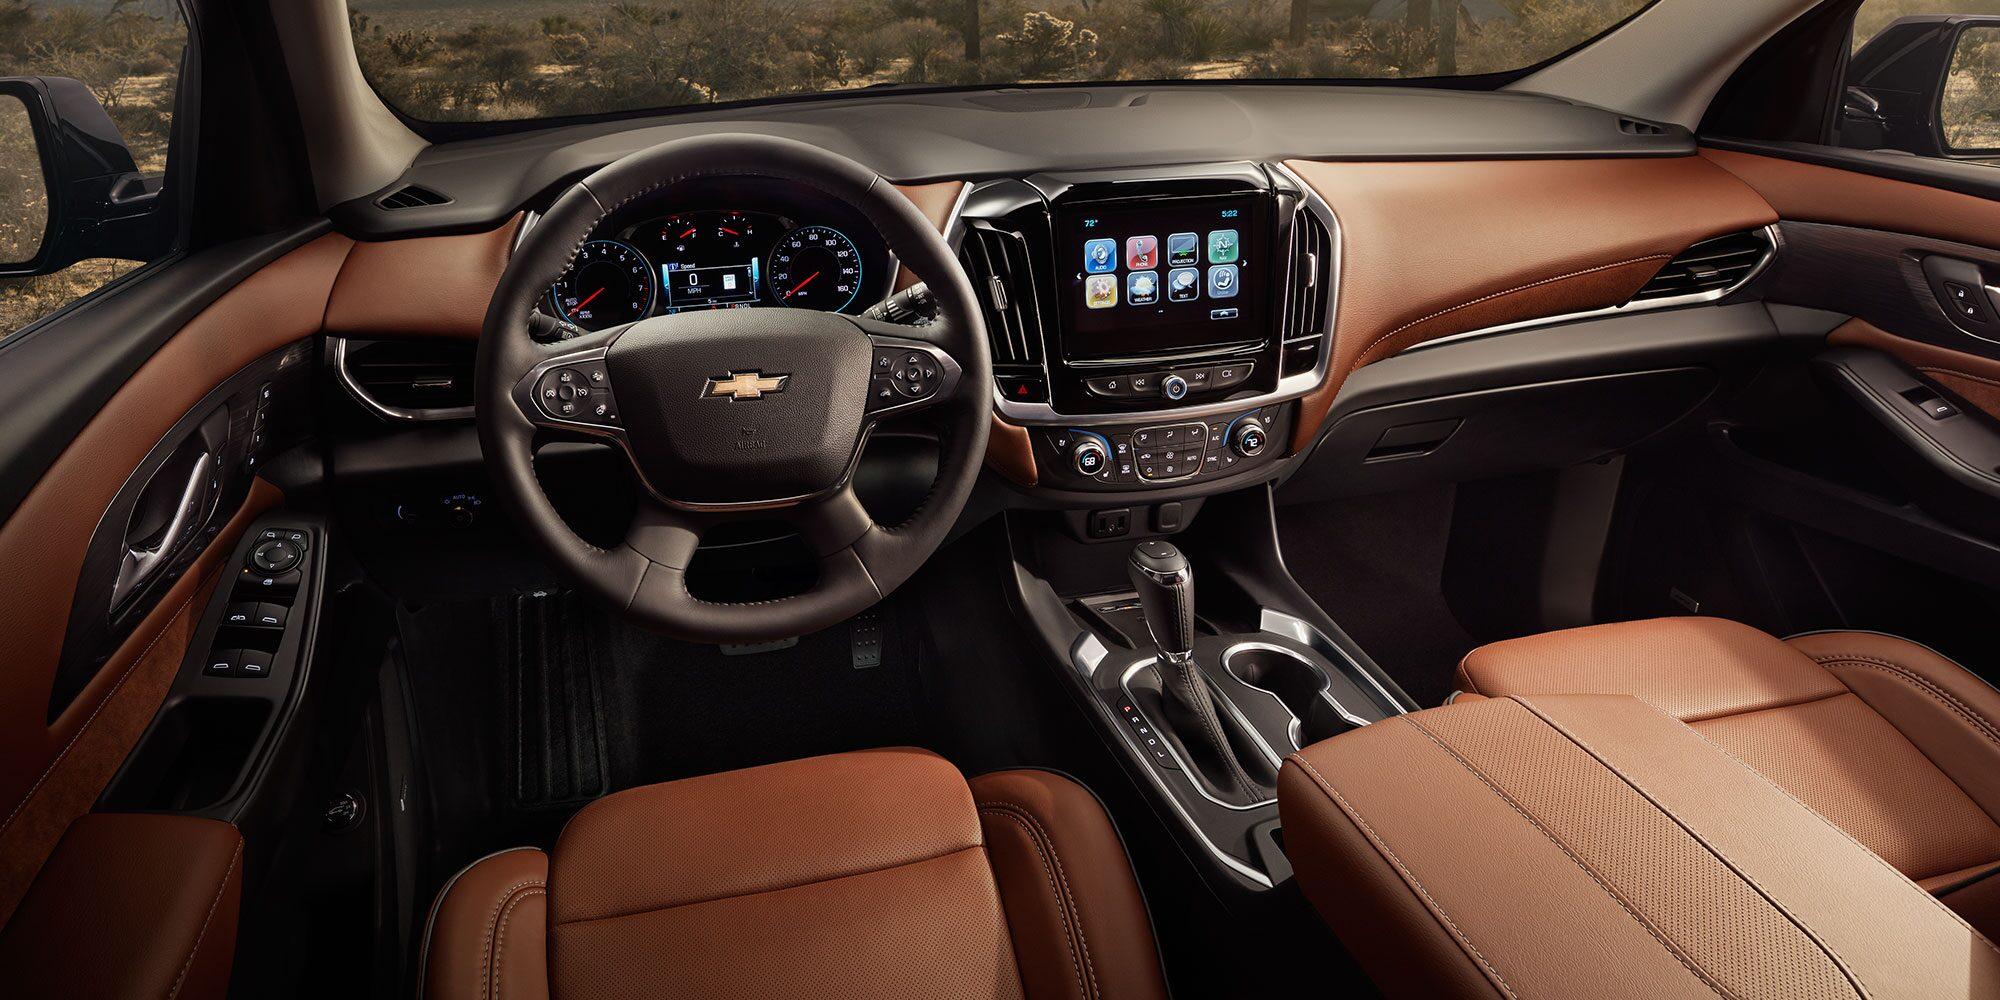 Beautiful 2018 Traverse Midsize SUV Interior Photo: Front Driver Seat